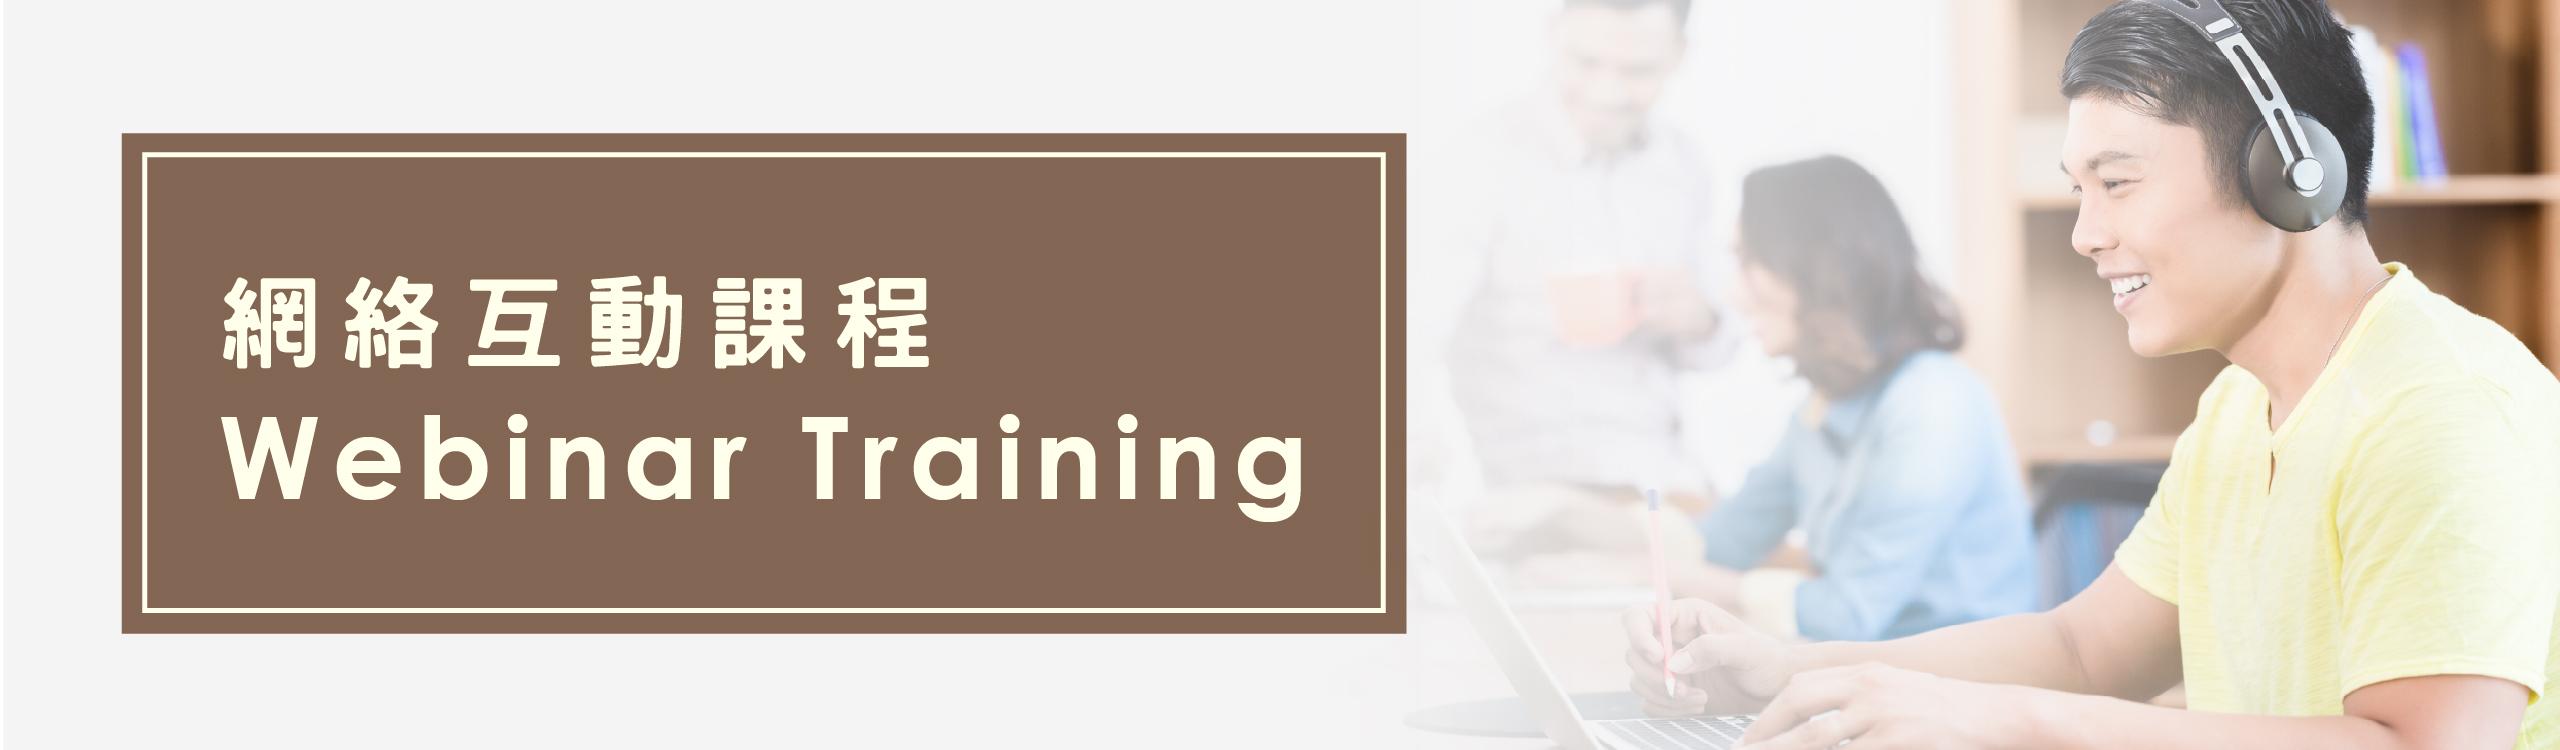 HKPC Academy Webinar Training